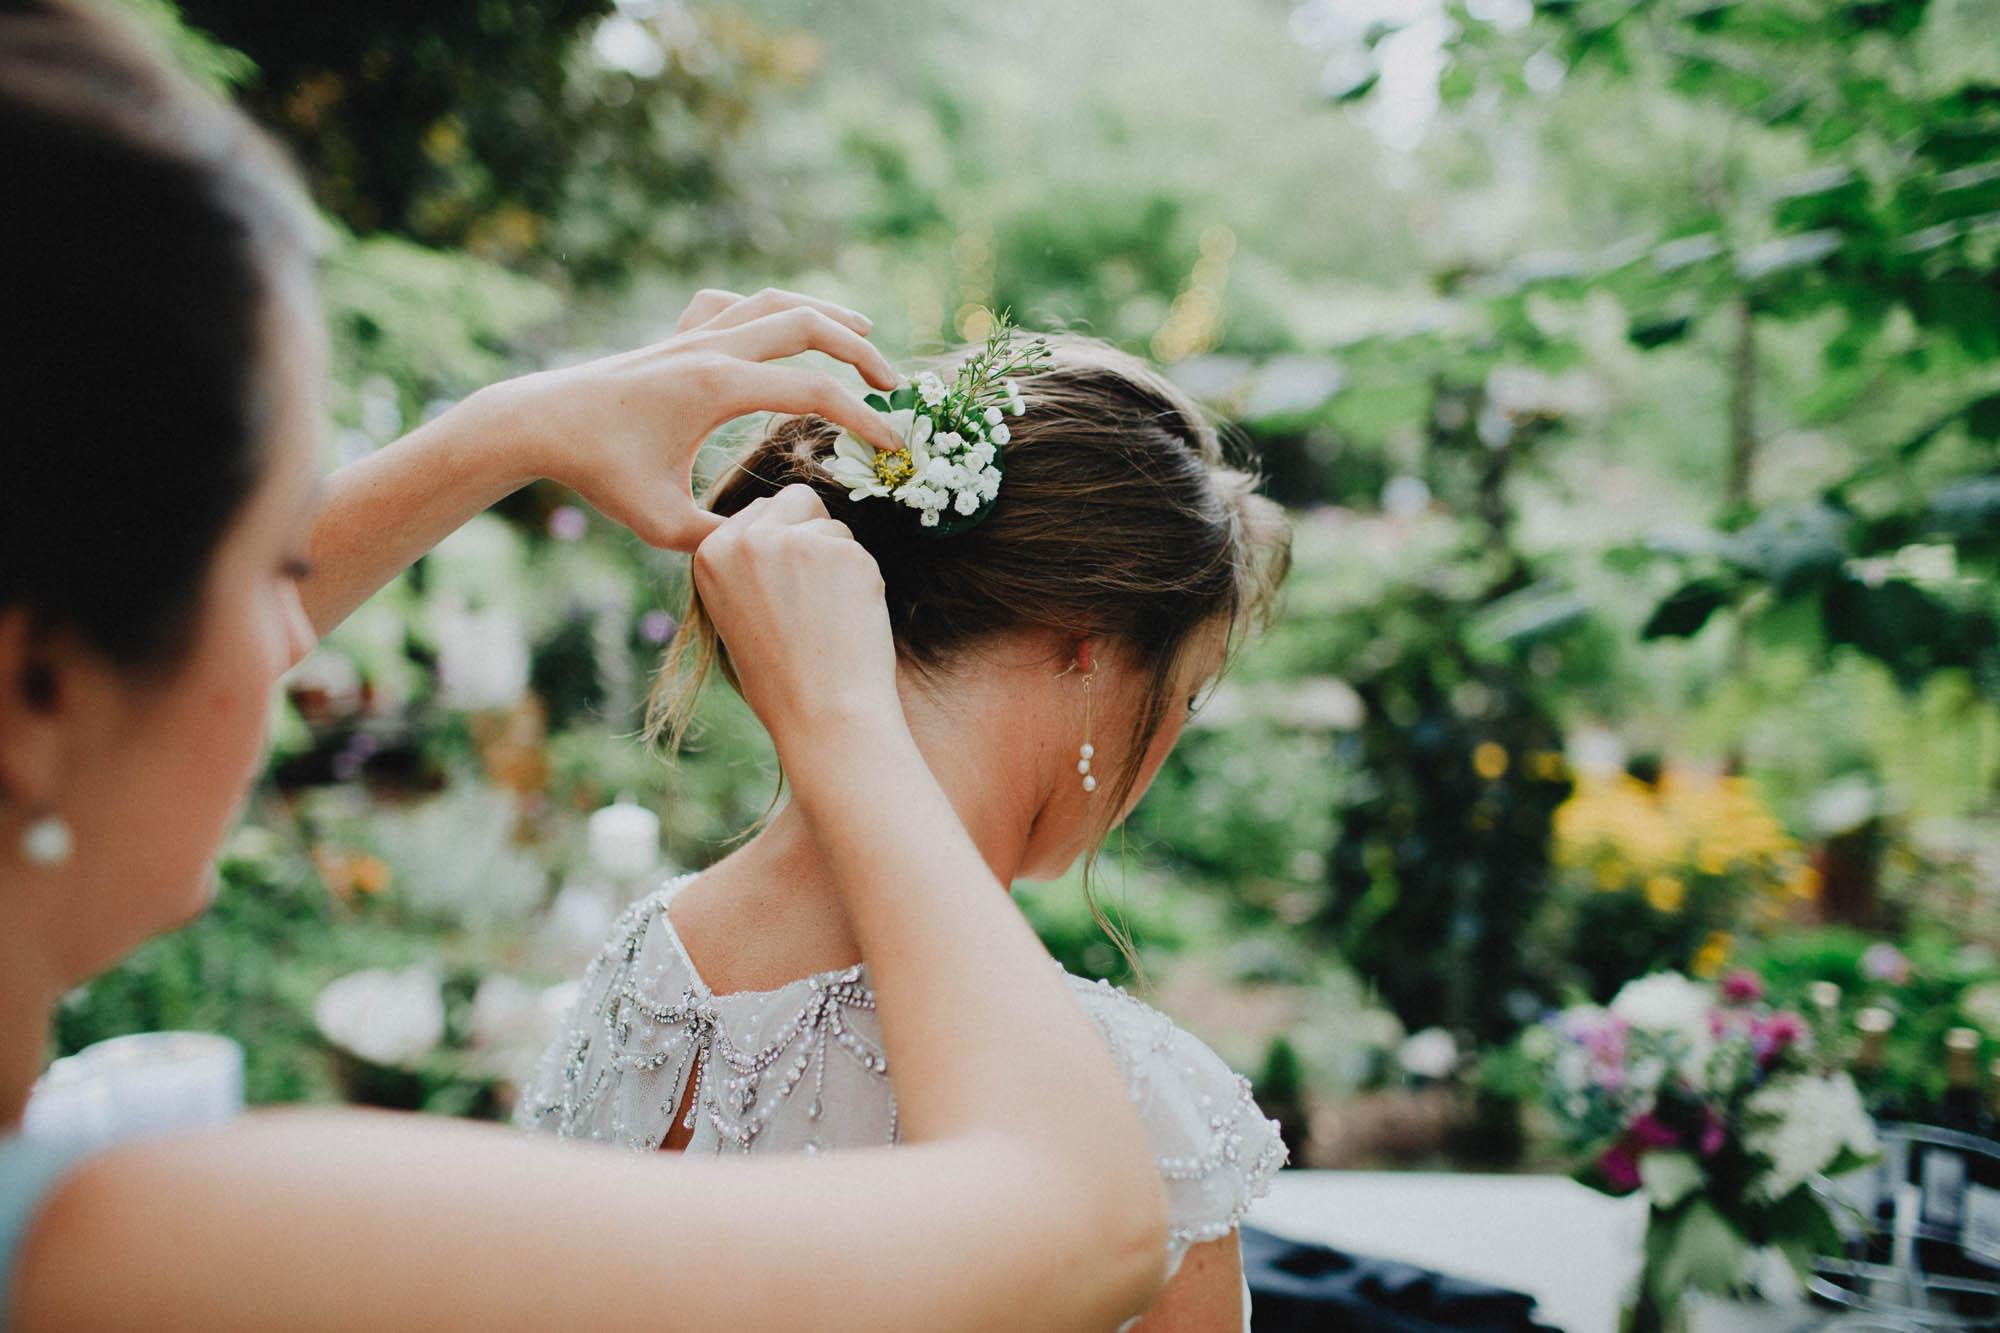 Leah-Graham-Michigan-Outdoor-DIY-Wedding-040@2x.jpg